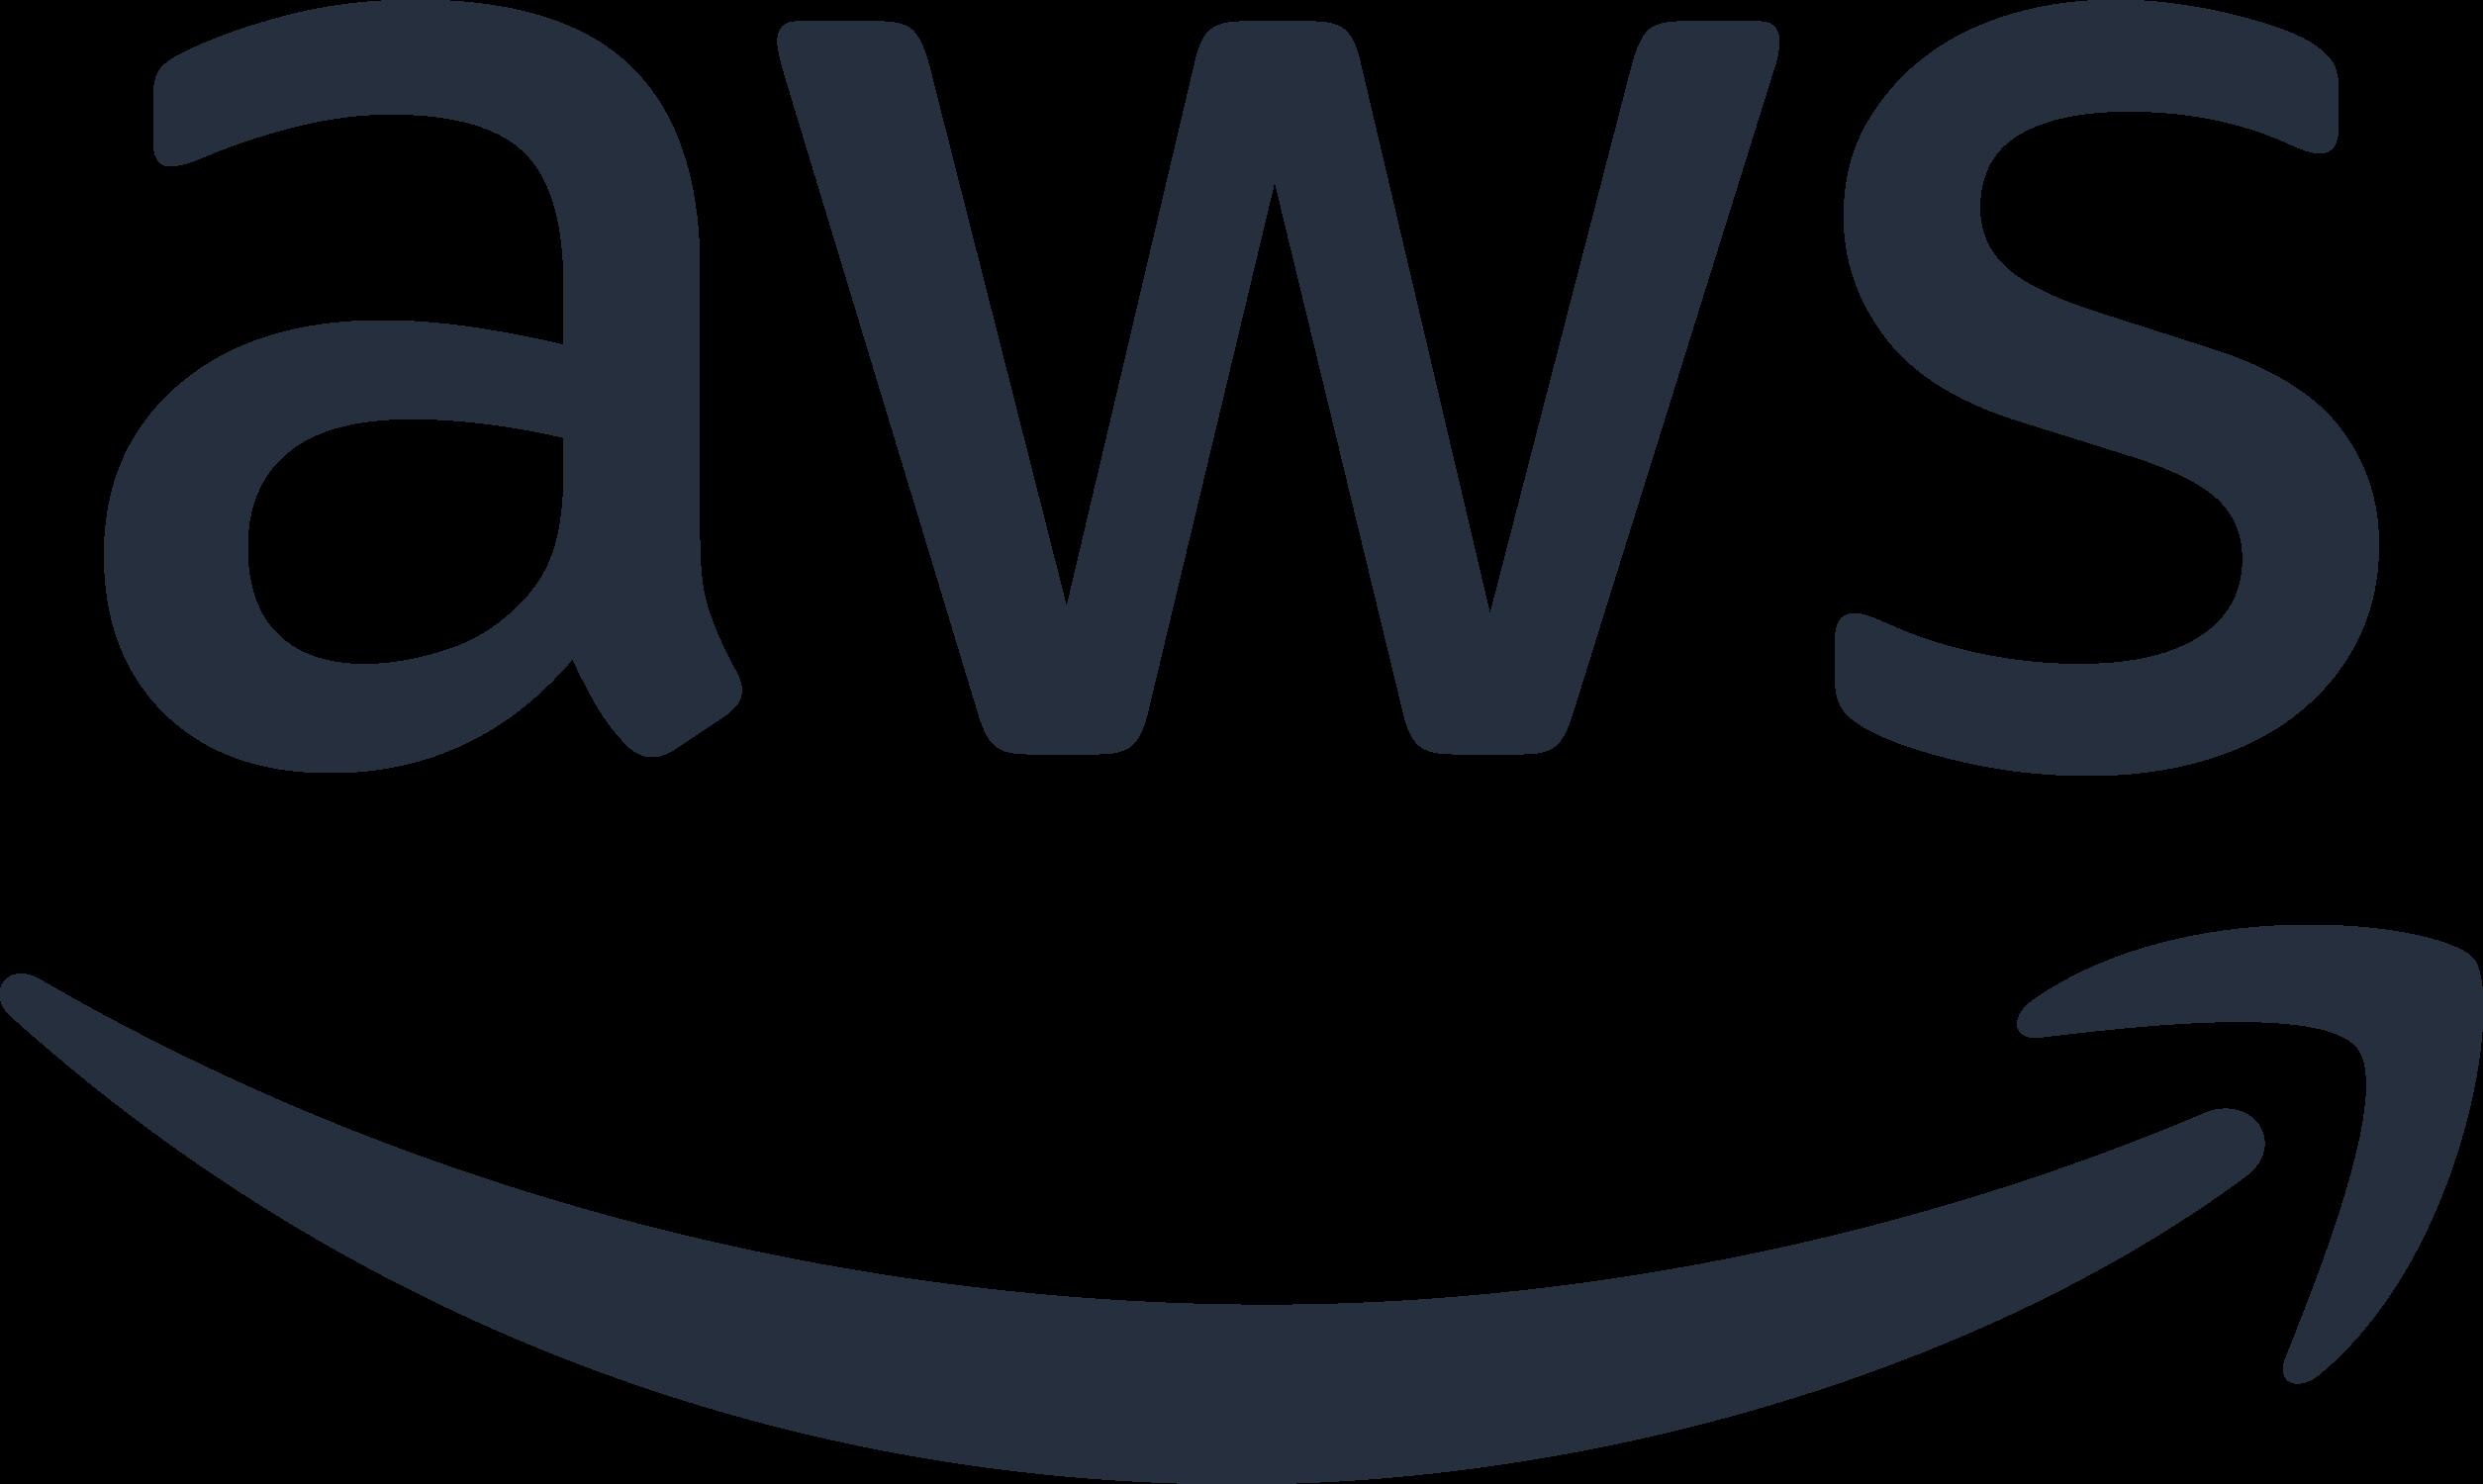 The D2C SummIt sponsor - AWS